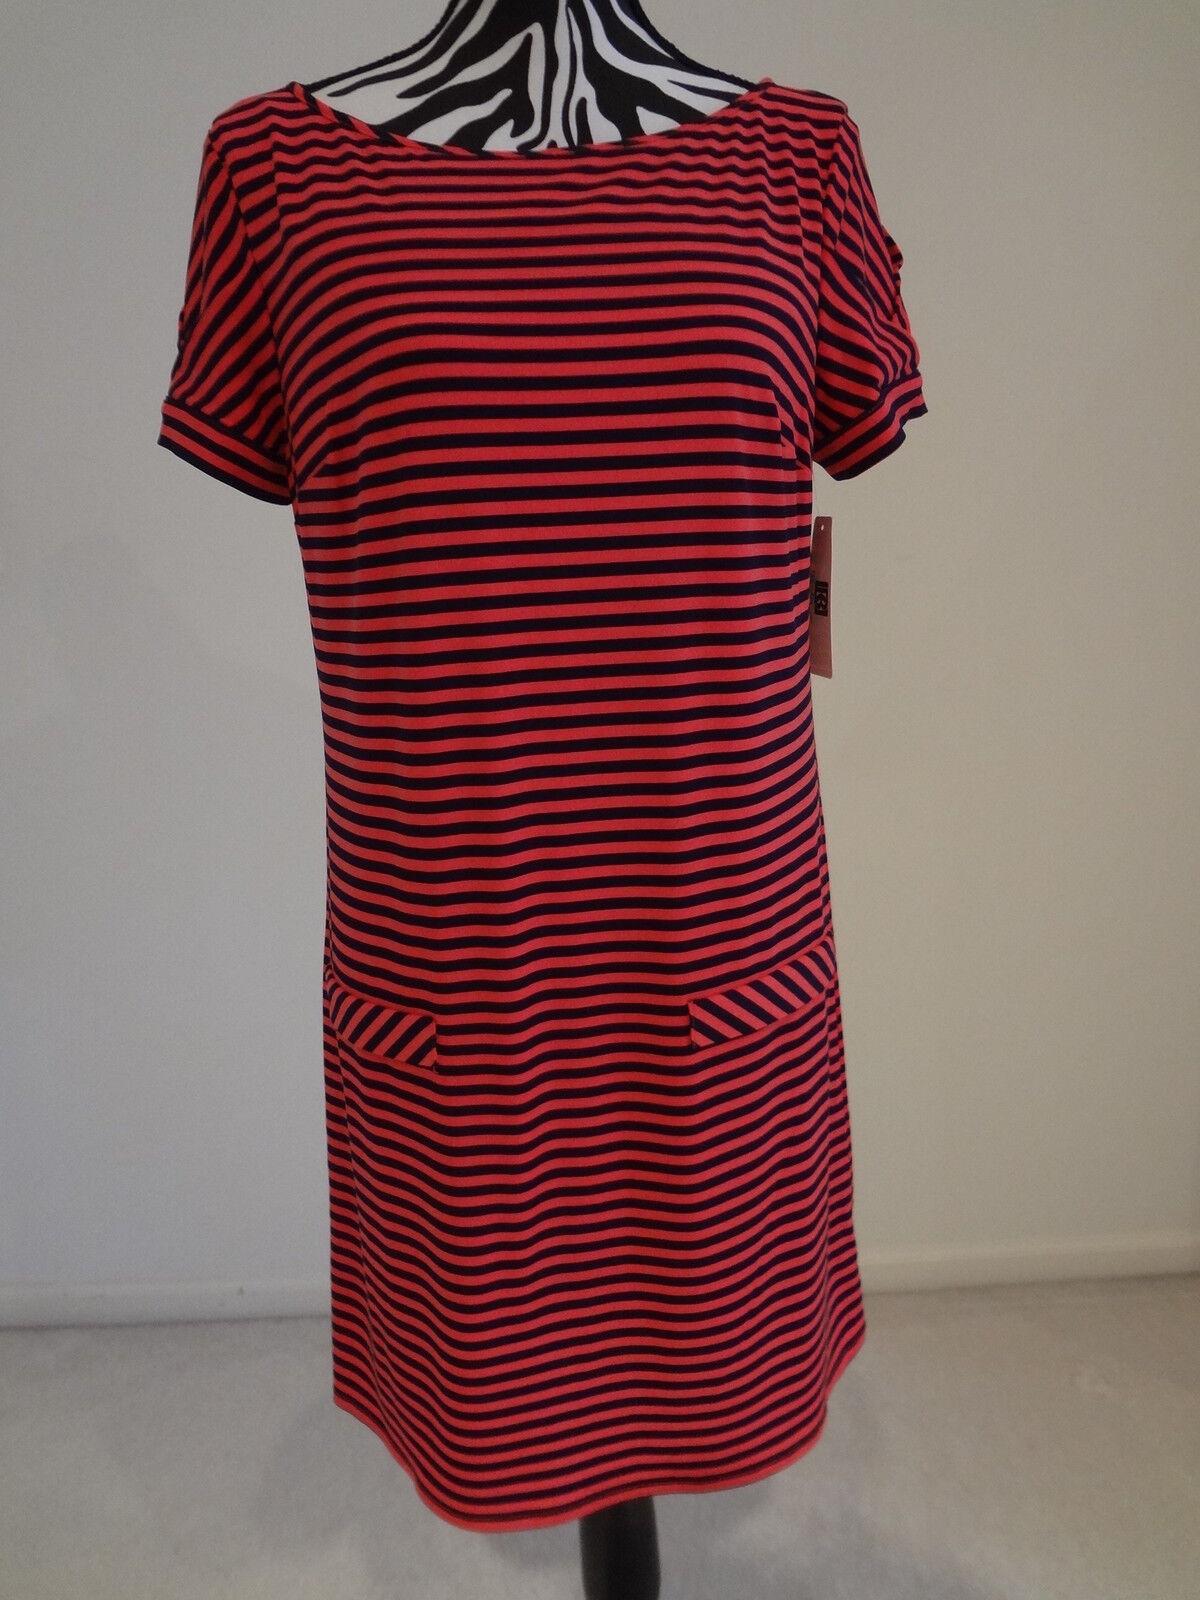 Nwt.ladies' laundry mutli color strip short sleeve dress;M